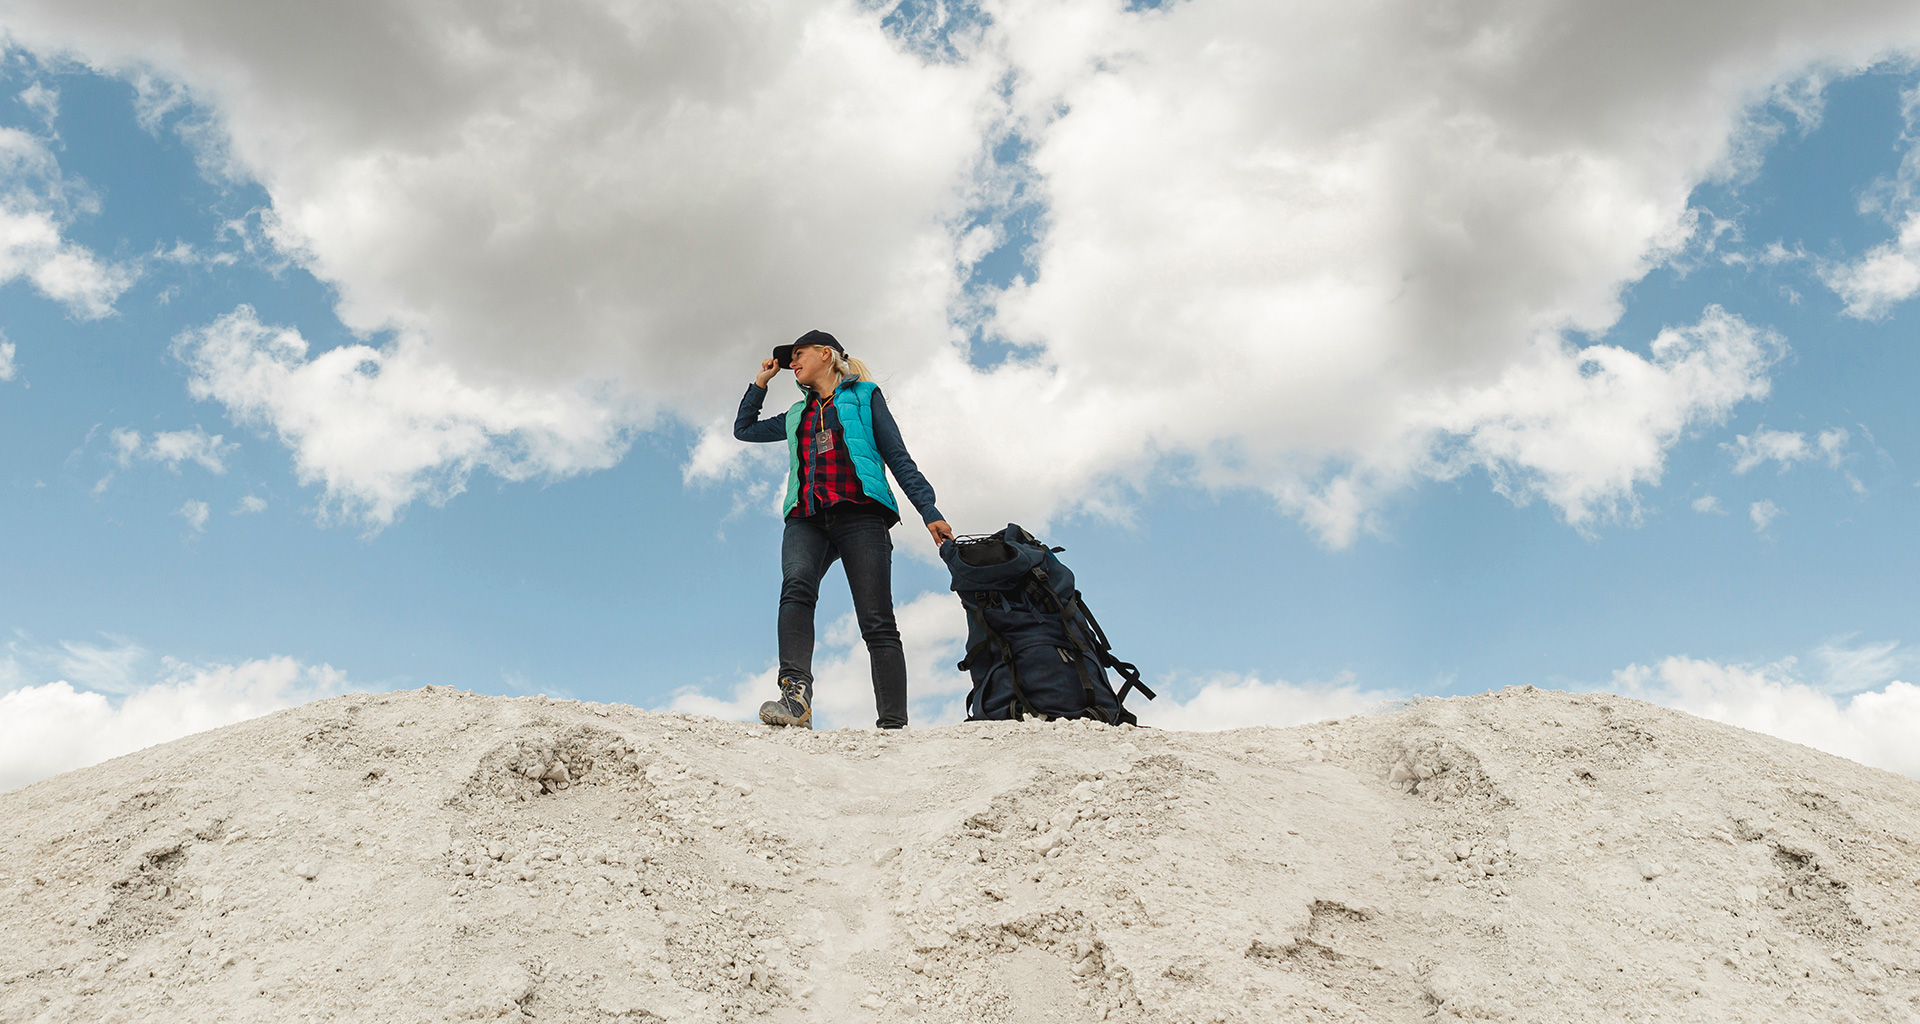 Travel Skyrocket Customer Retention - Intalk.io